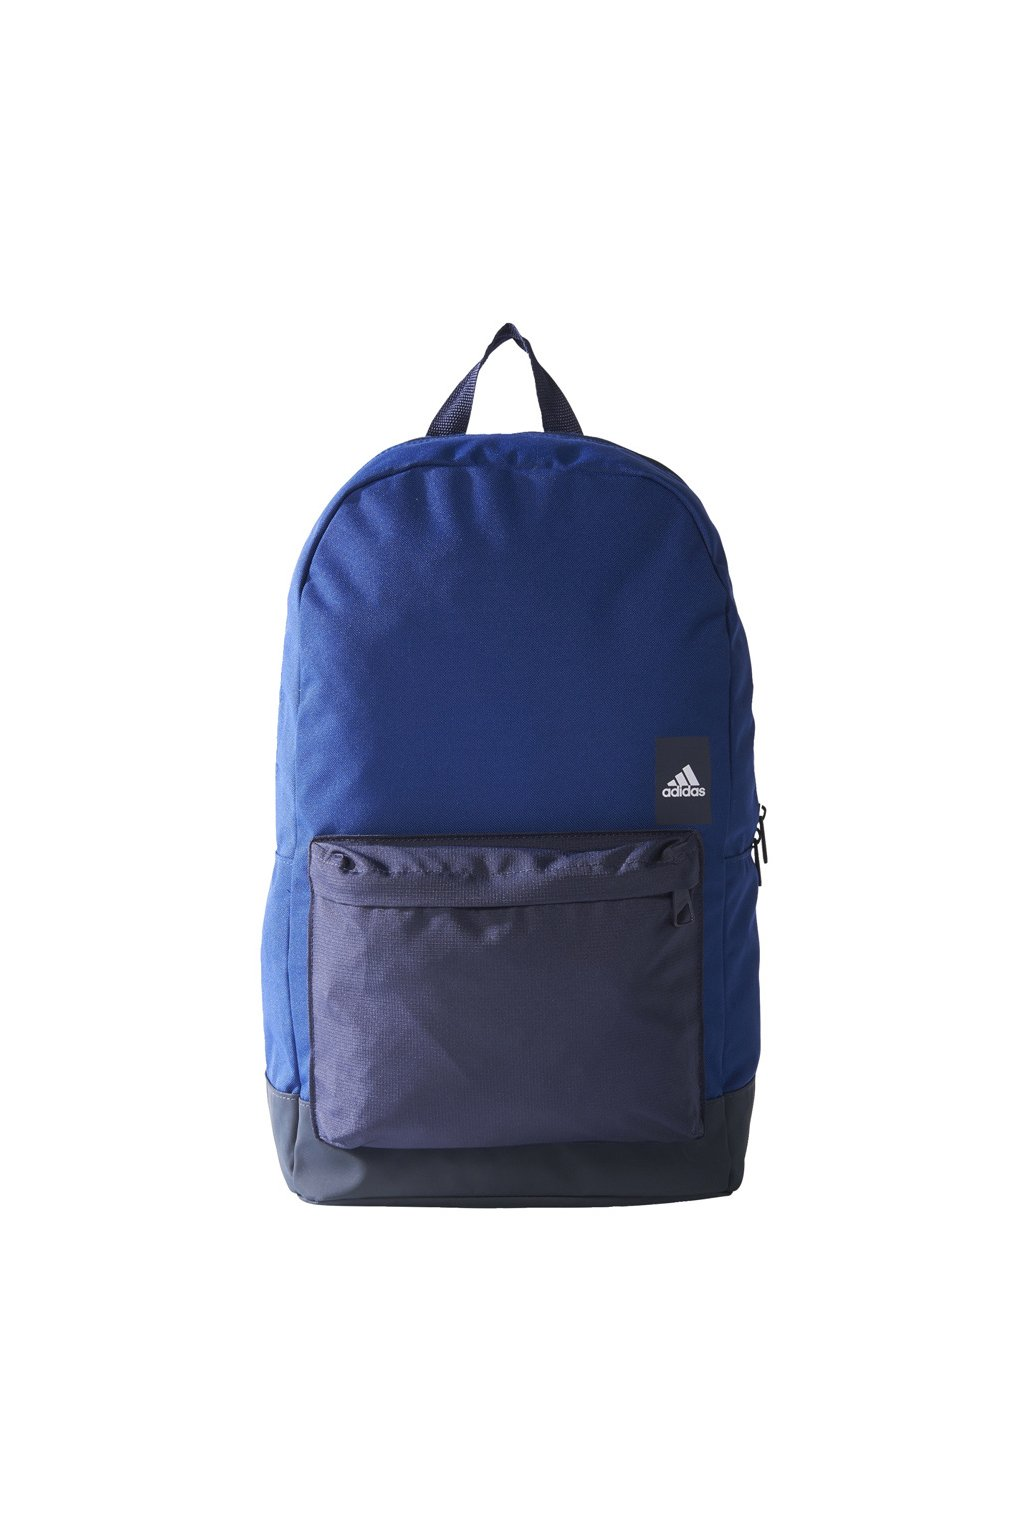 Batoh Adidas A CLASSIC M BLO modrý BR1562